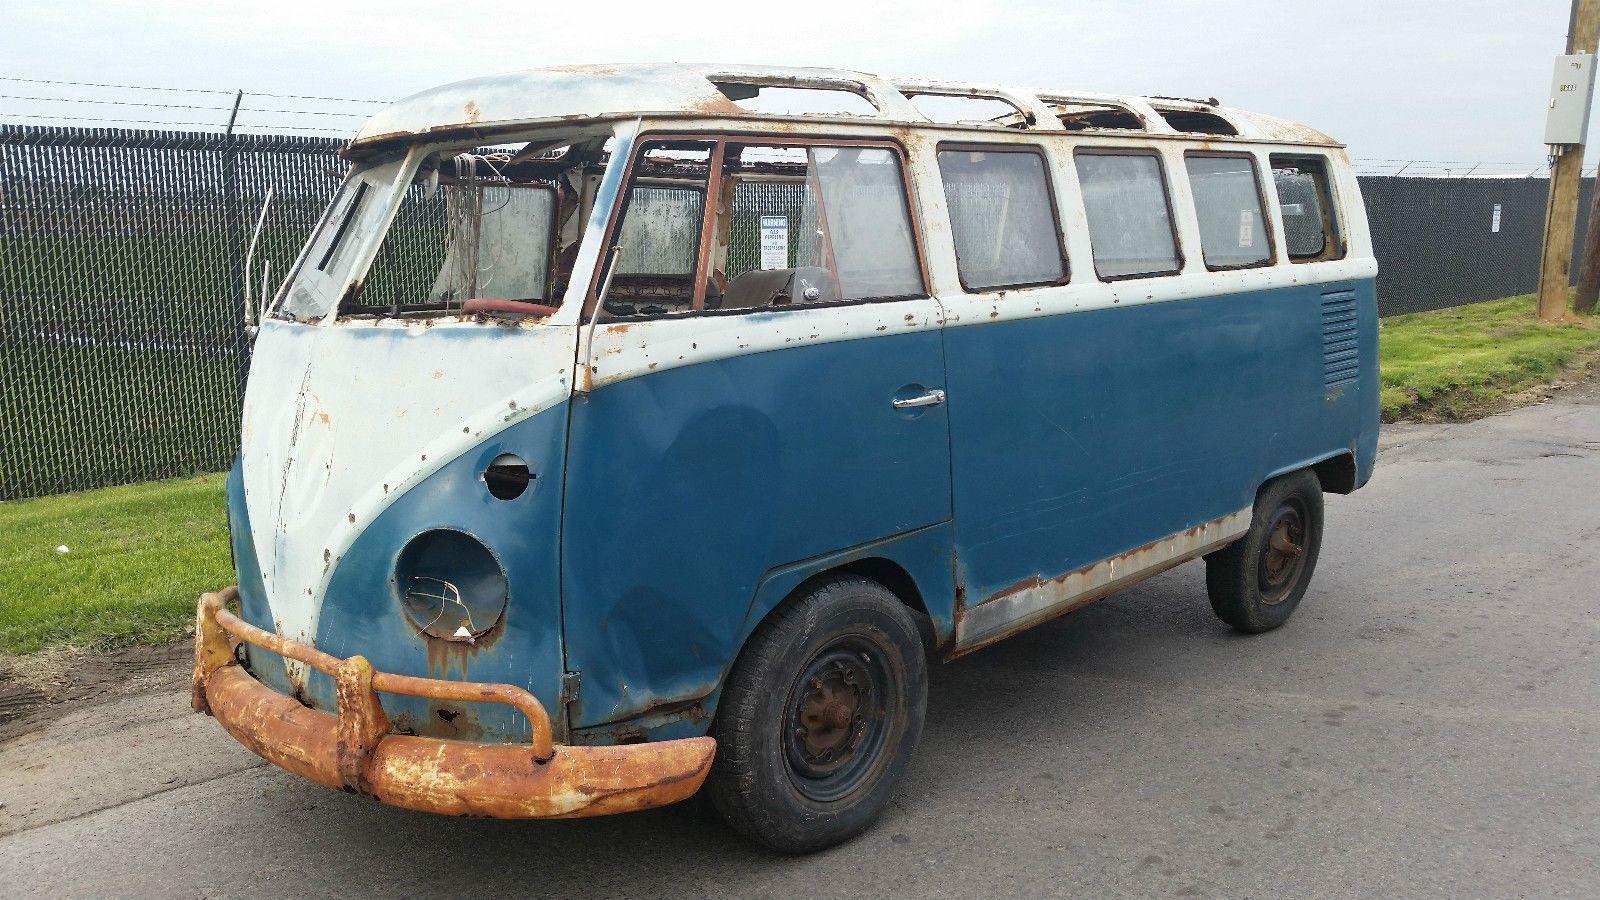 details about 1965 volkswagen bus vanagon 21 window samba. Black Bedroom Furniture Sets. Home Design Ideas